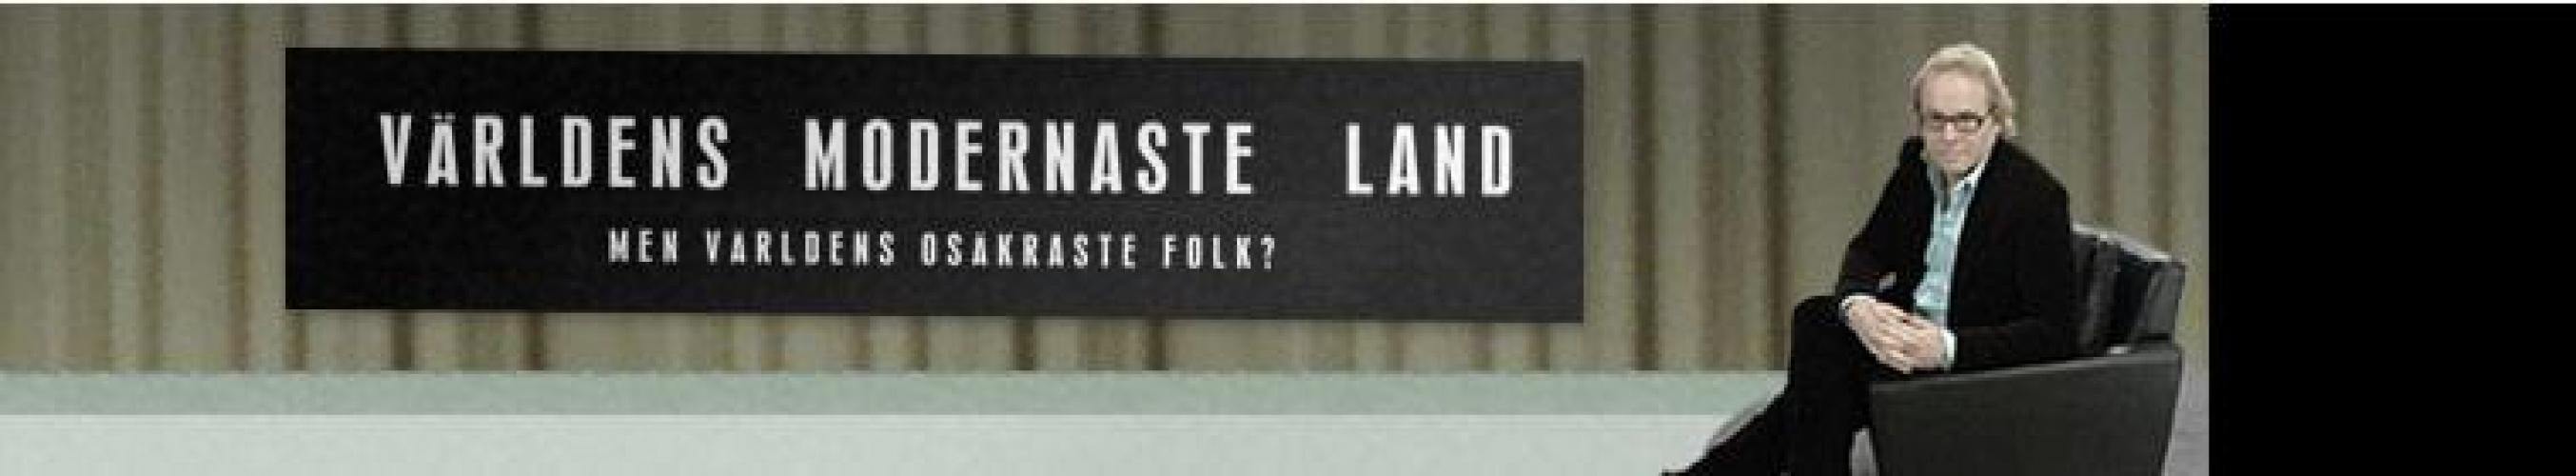 Världens modernaste land next episode air date poster